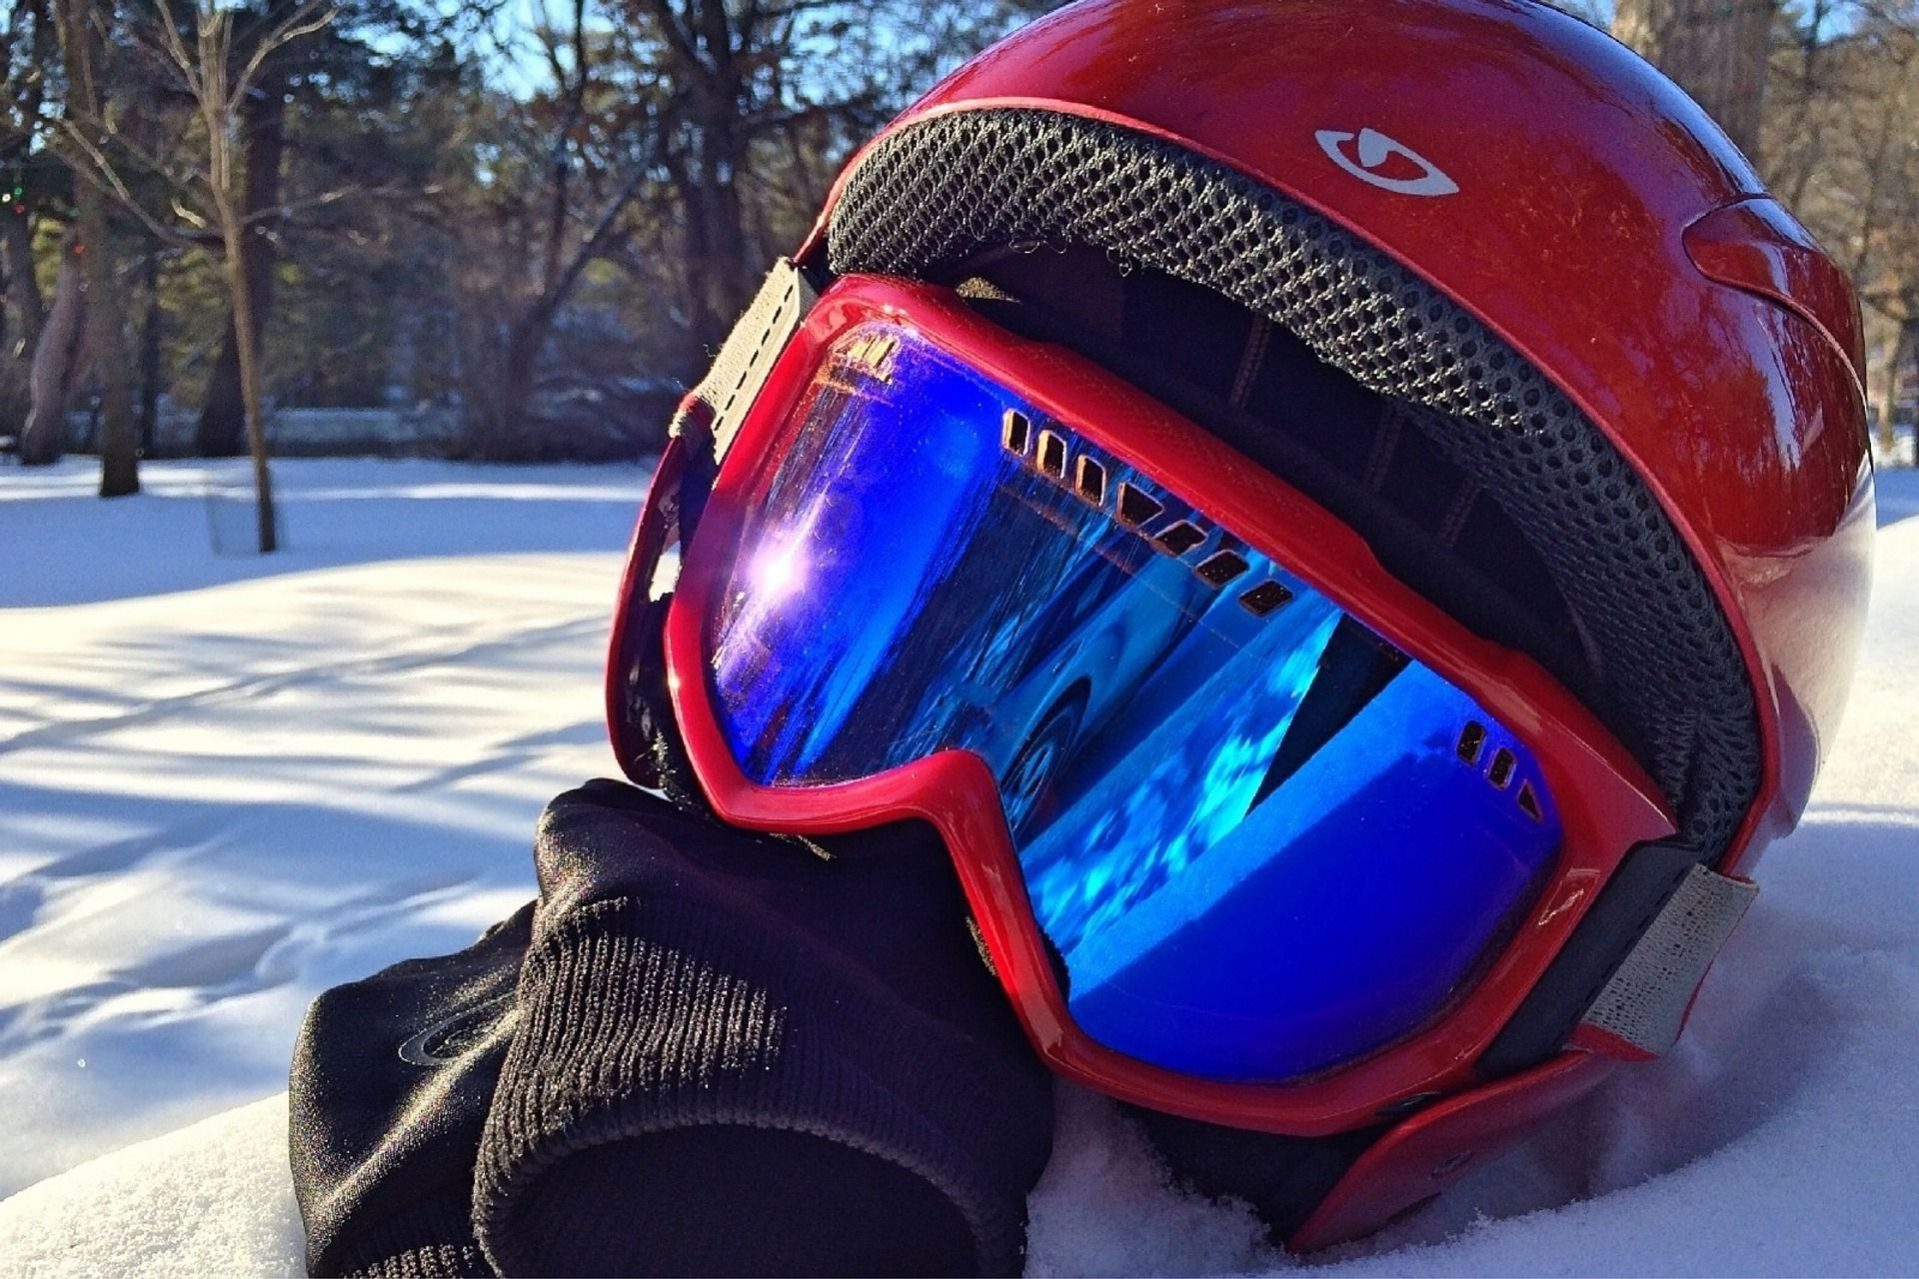 masque de ski dans la neige